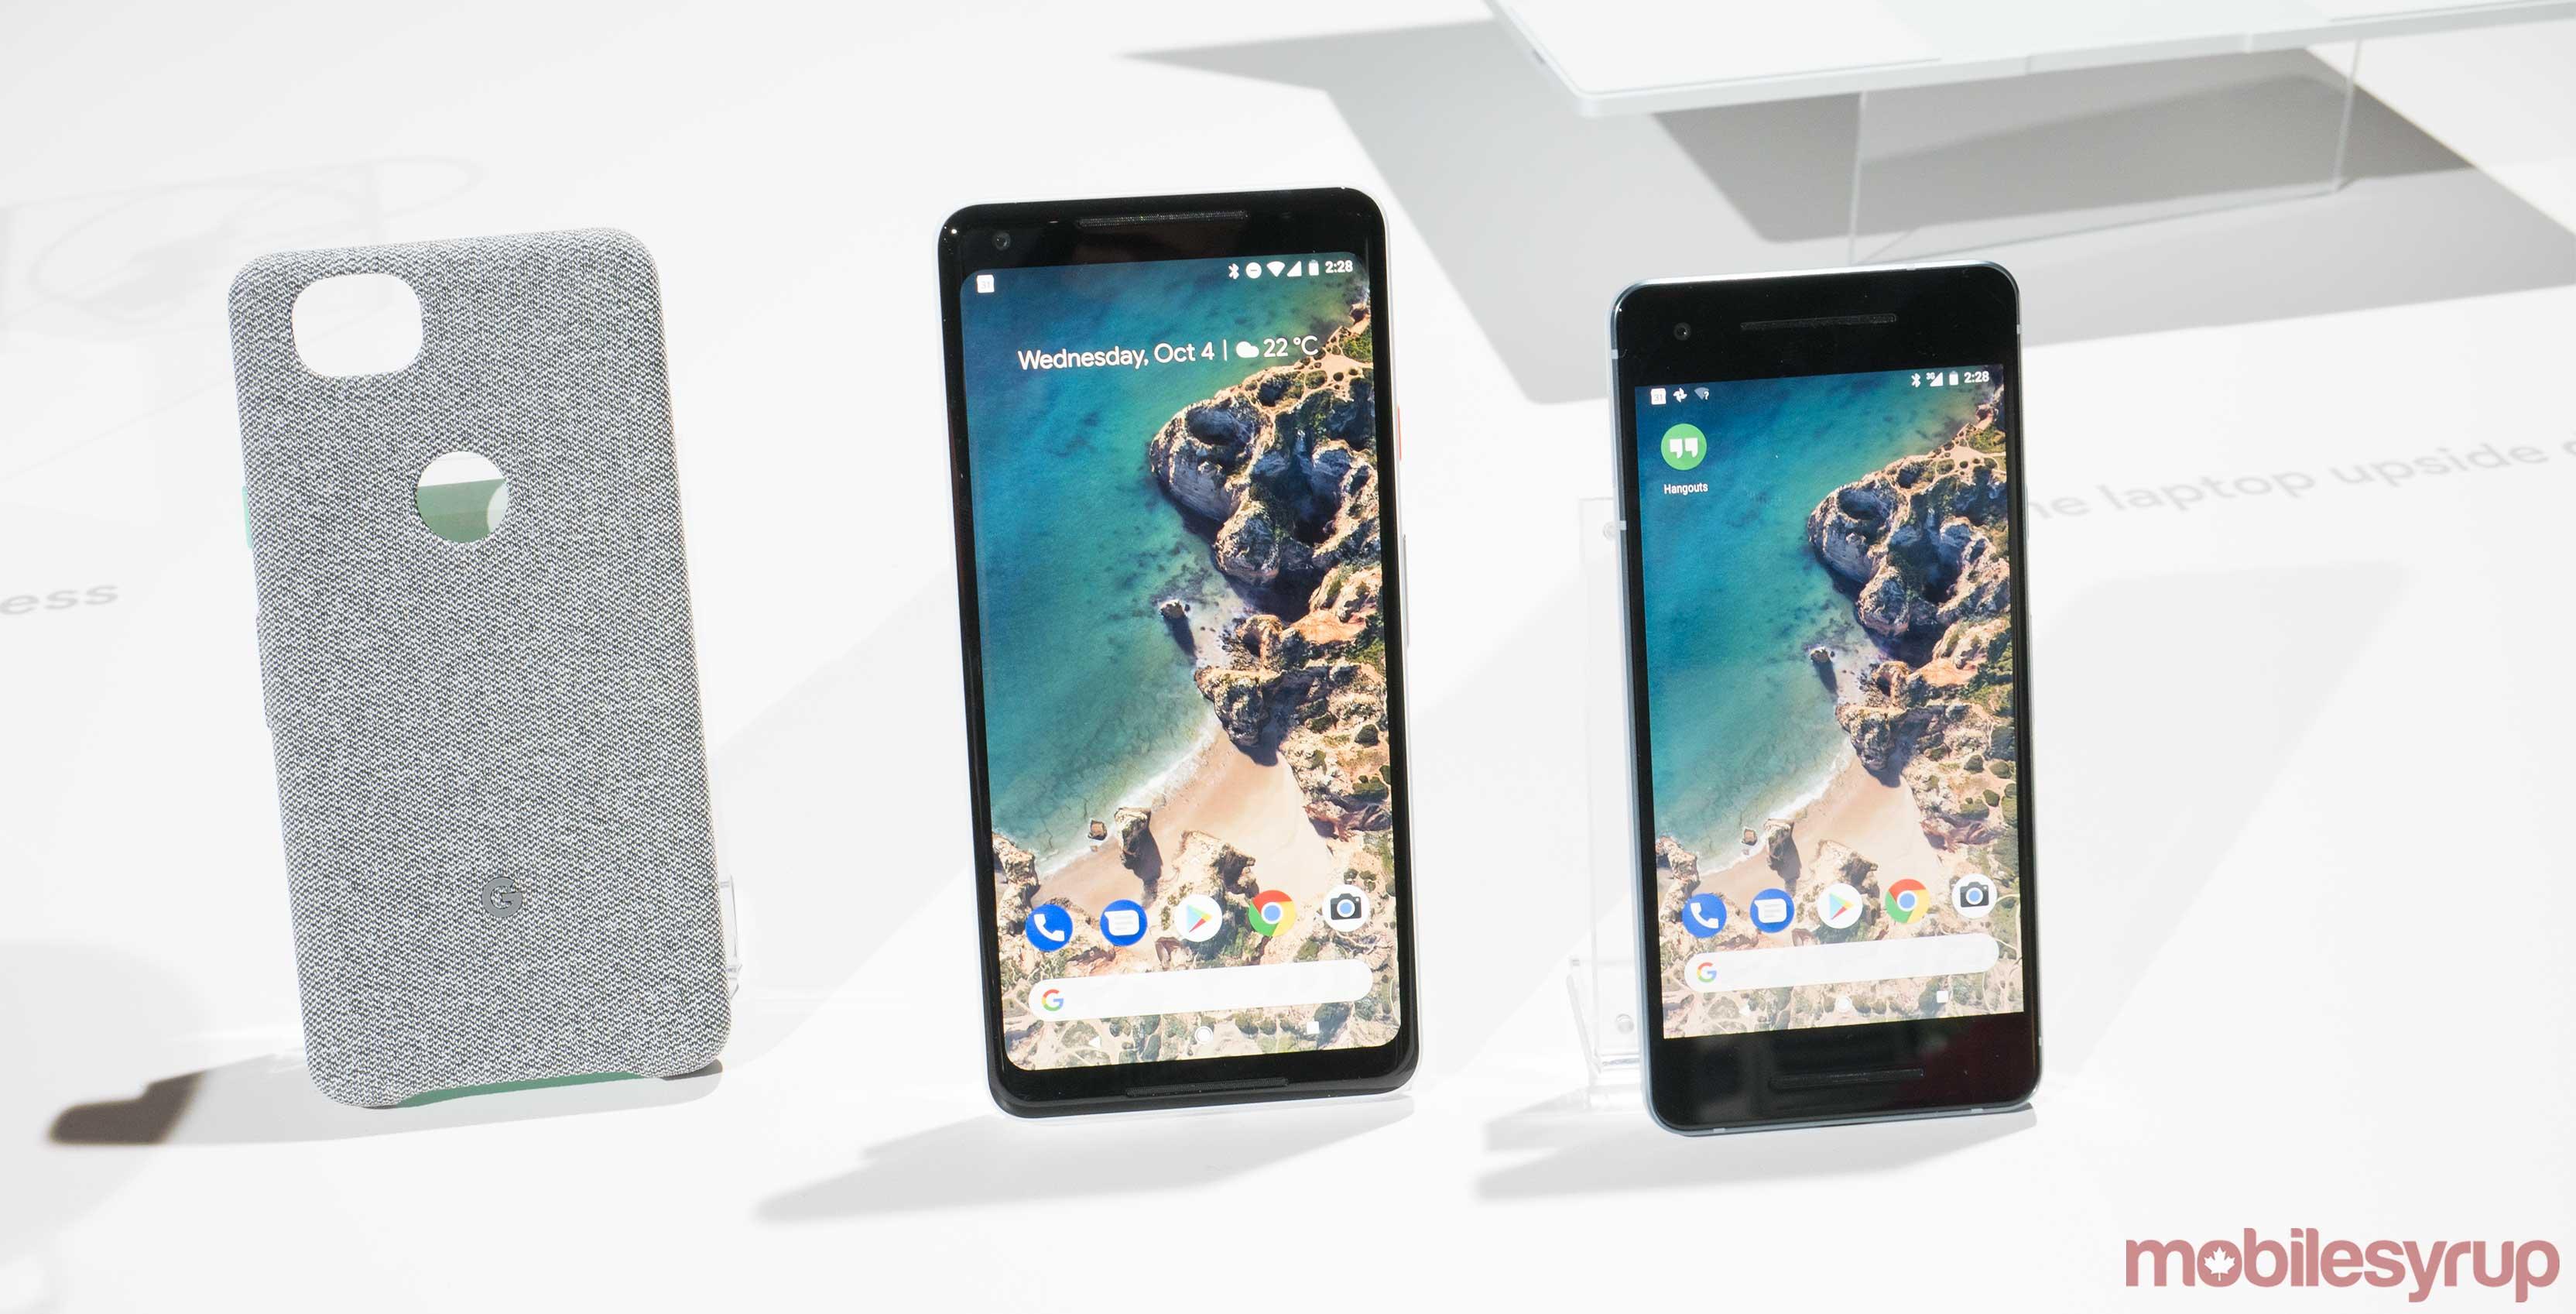 Google Pixel 2 and Google Pixel 2 XL review